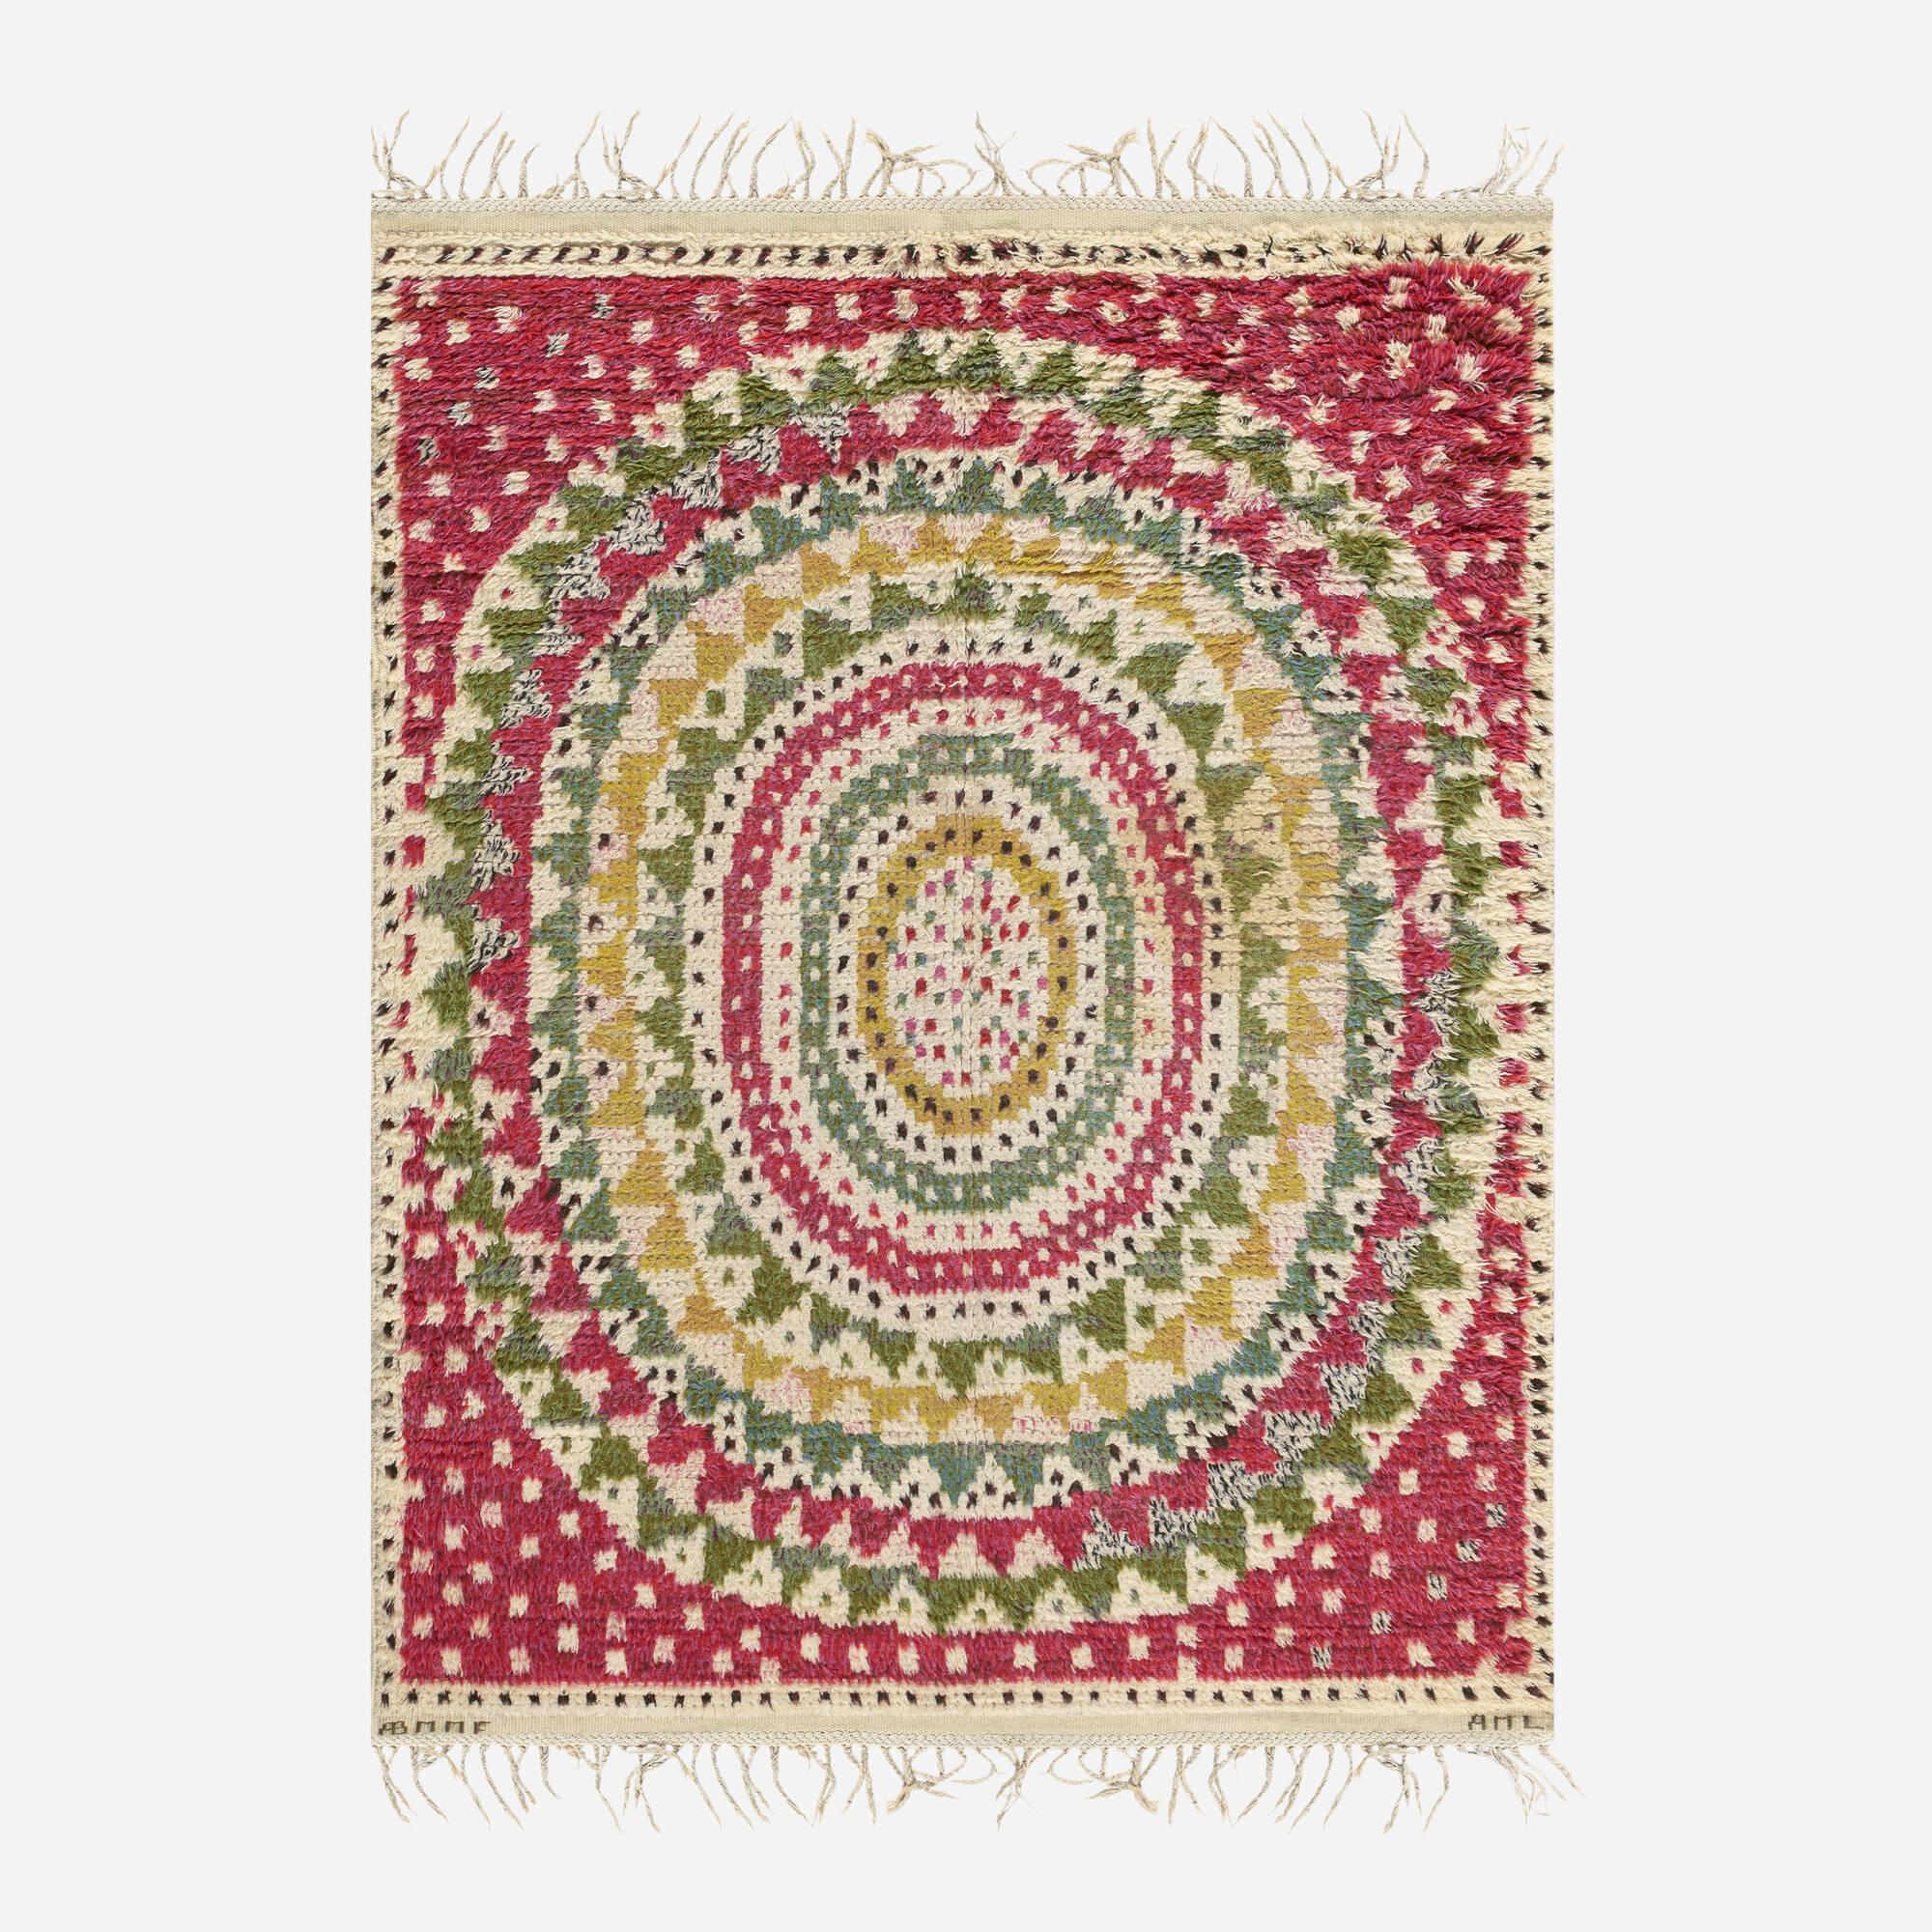 117: Ann-Mari Forsberg / Ovala Ryan rya carpet (1 of 2)